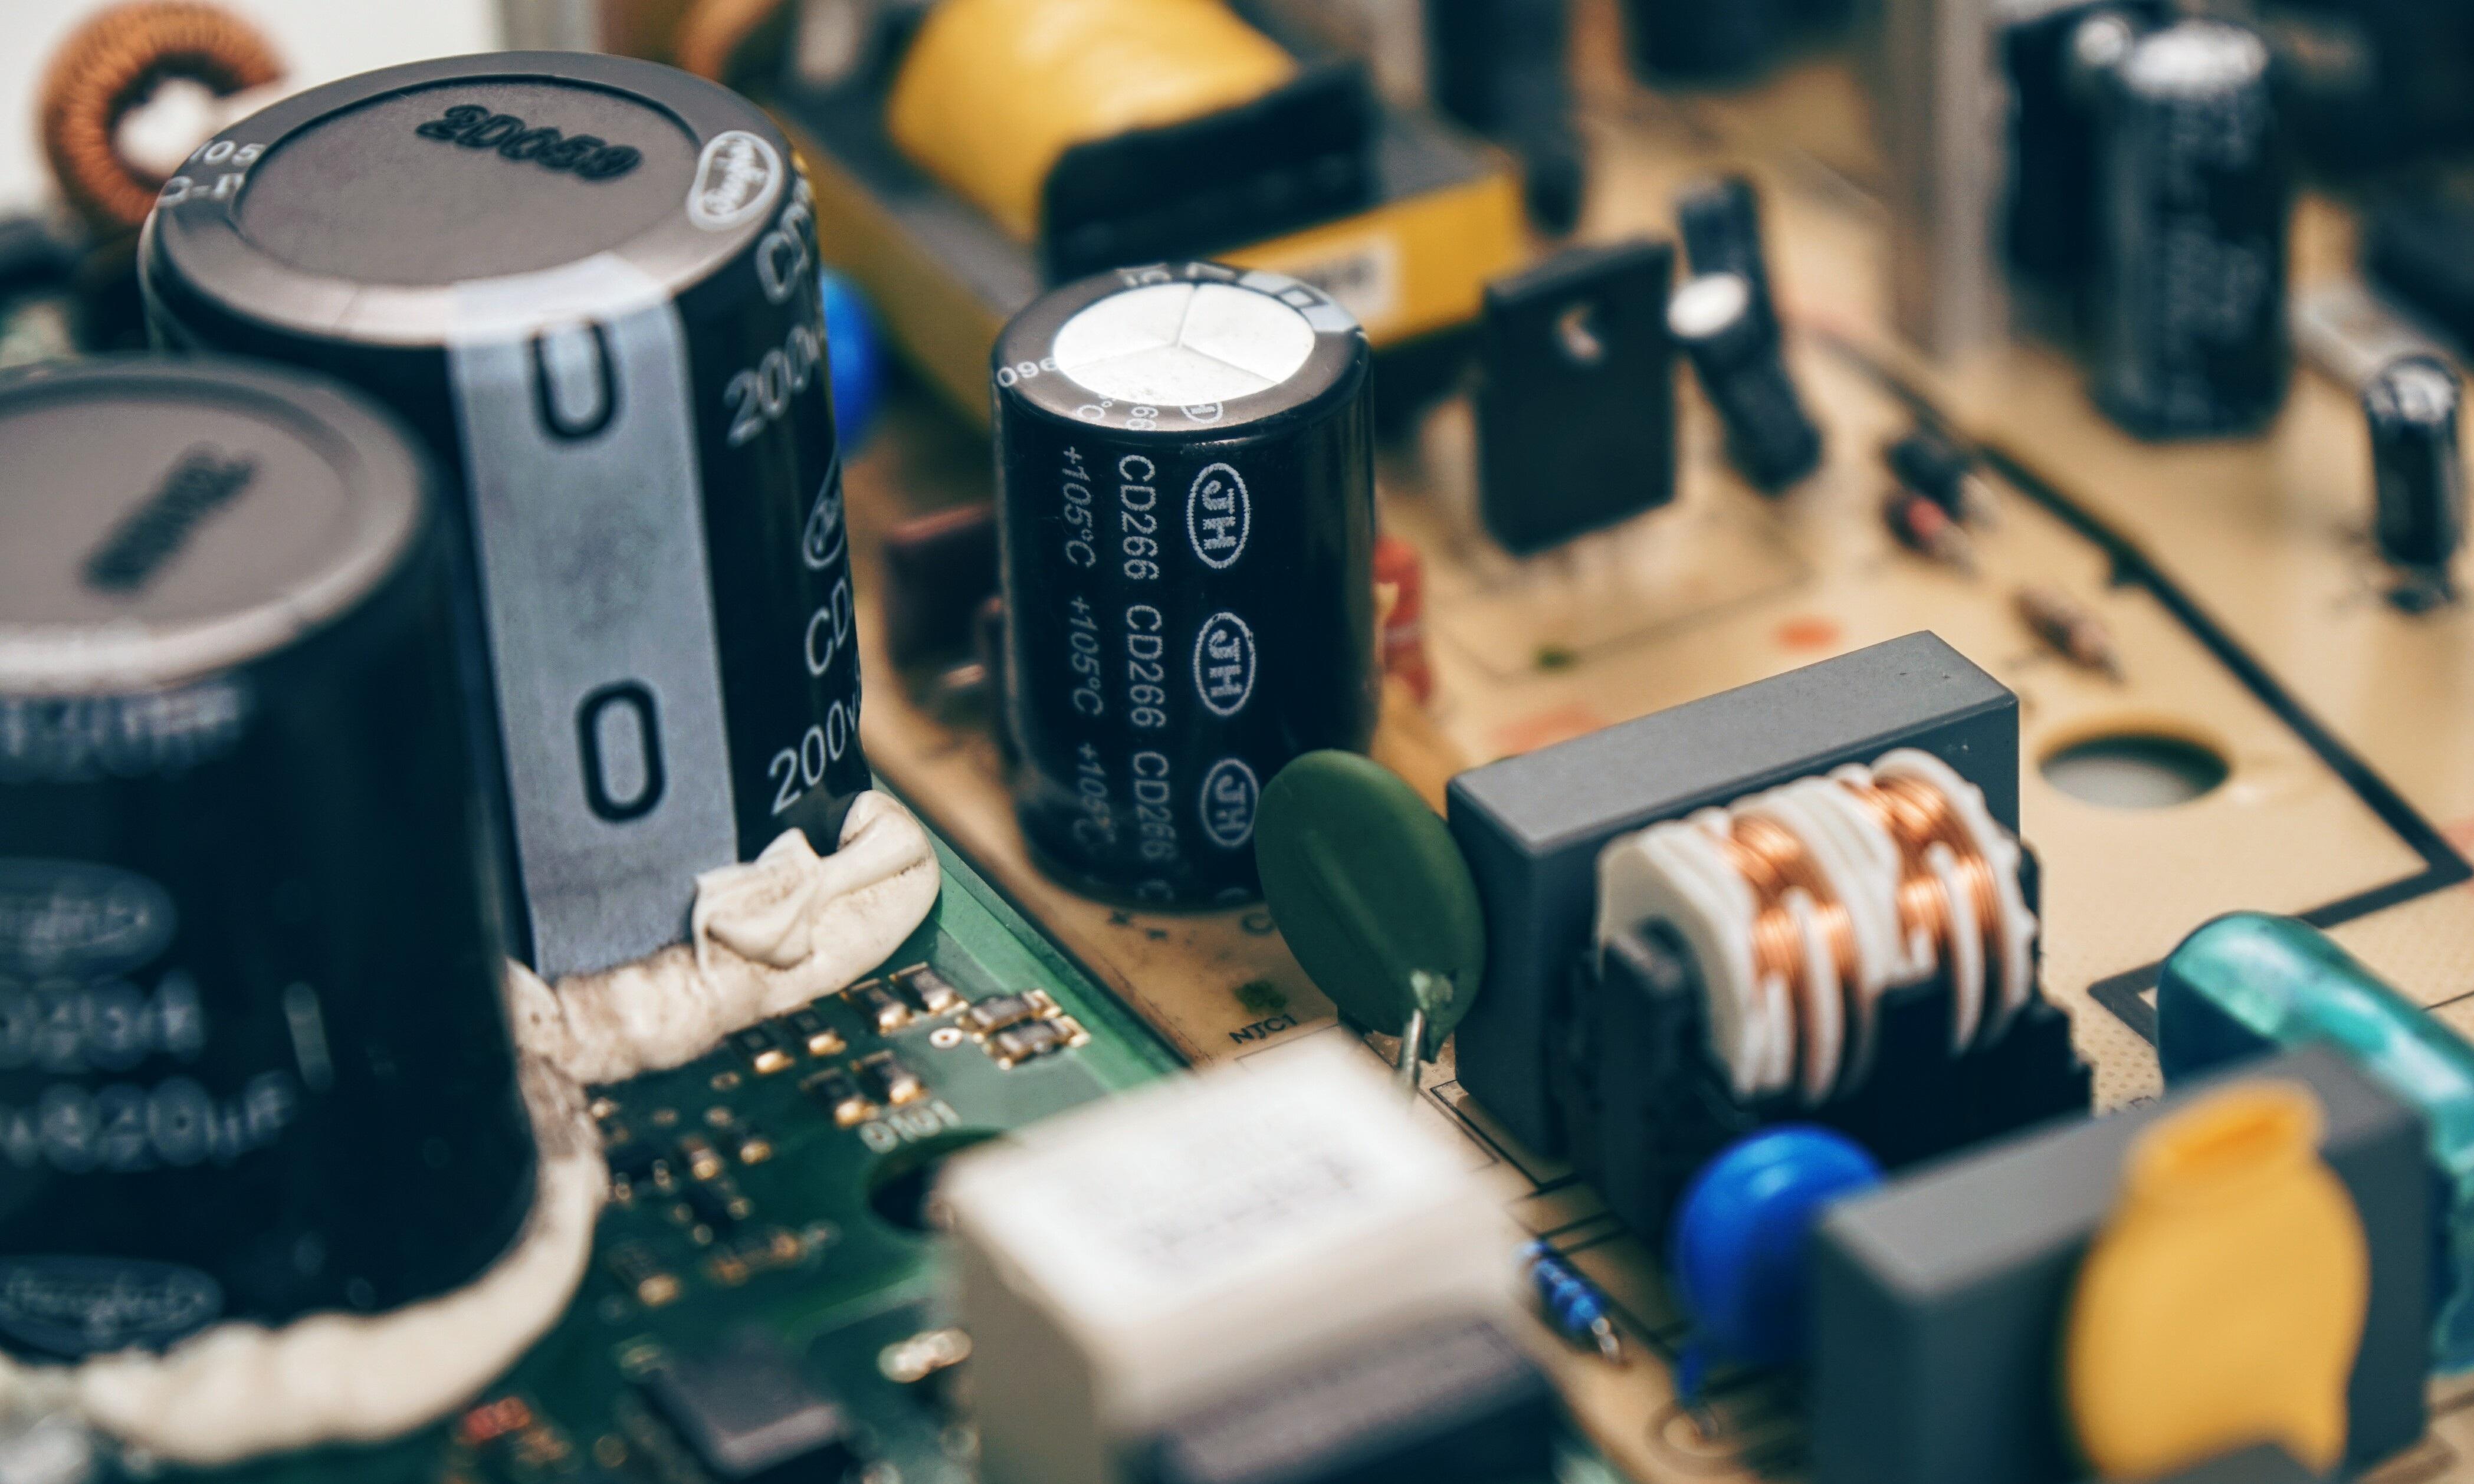 Замена конденсаторов на матплате